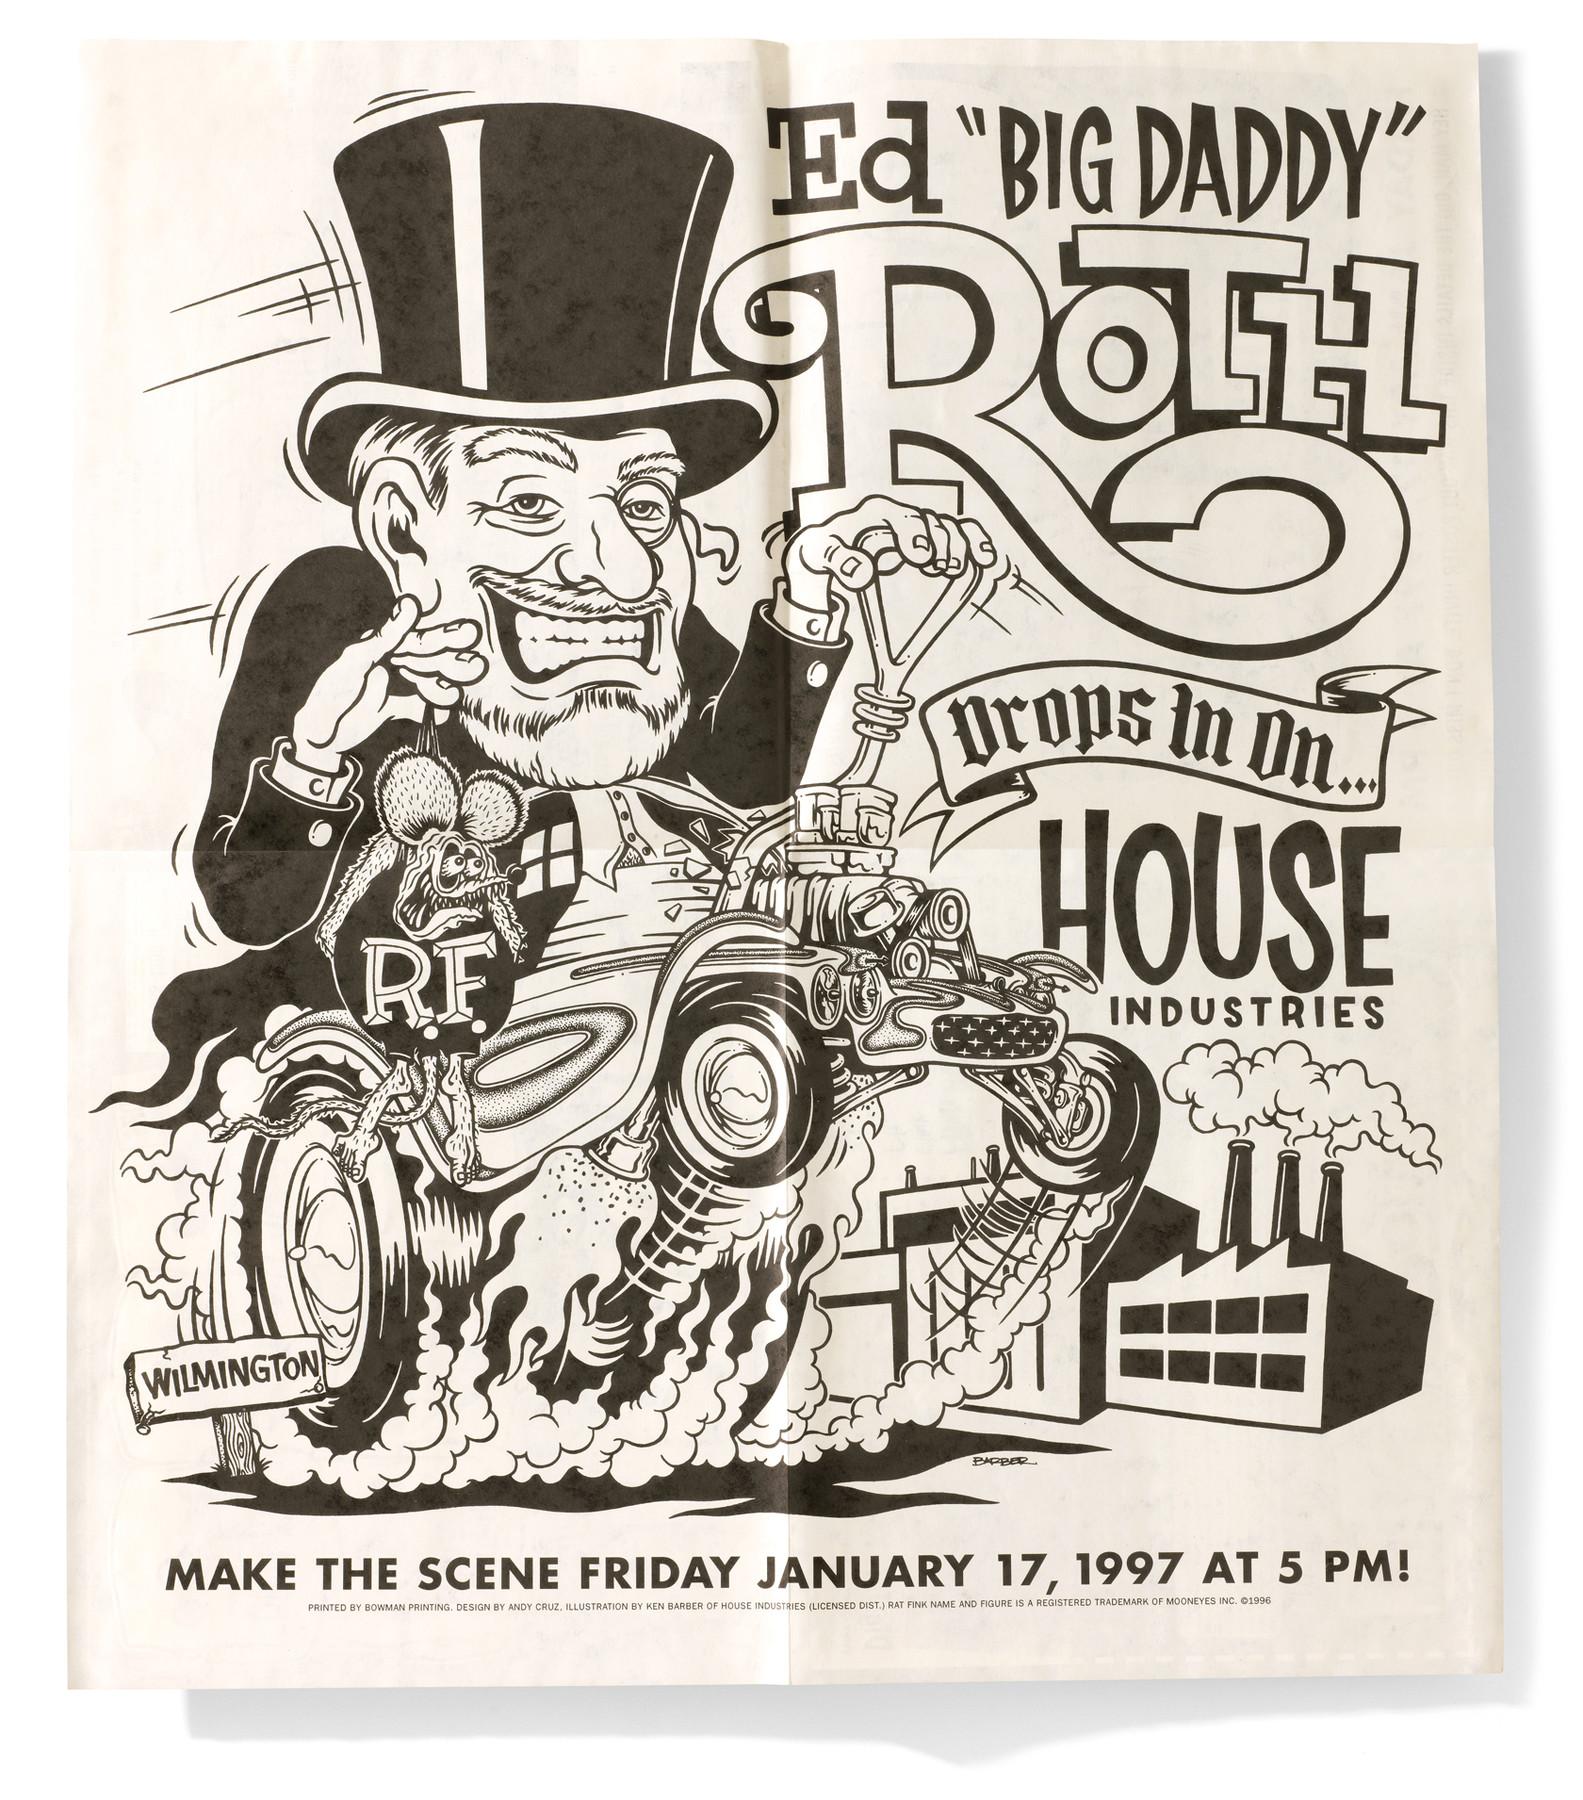 Ed Big Daddy Roth House Industries